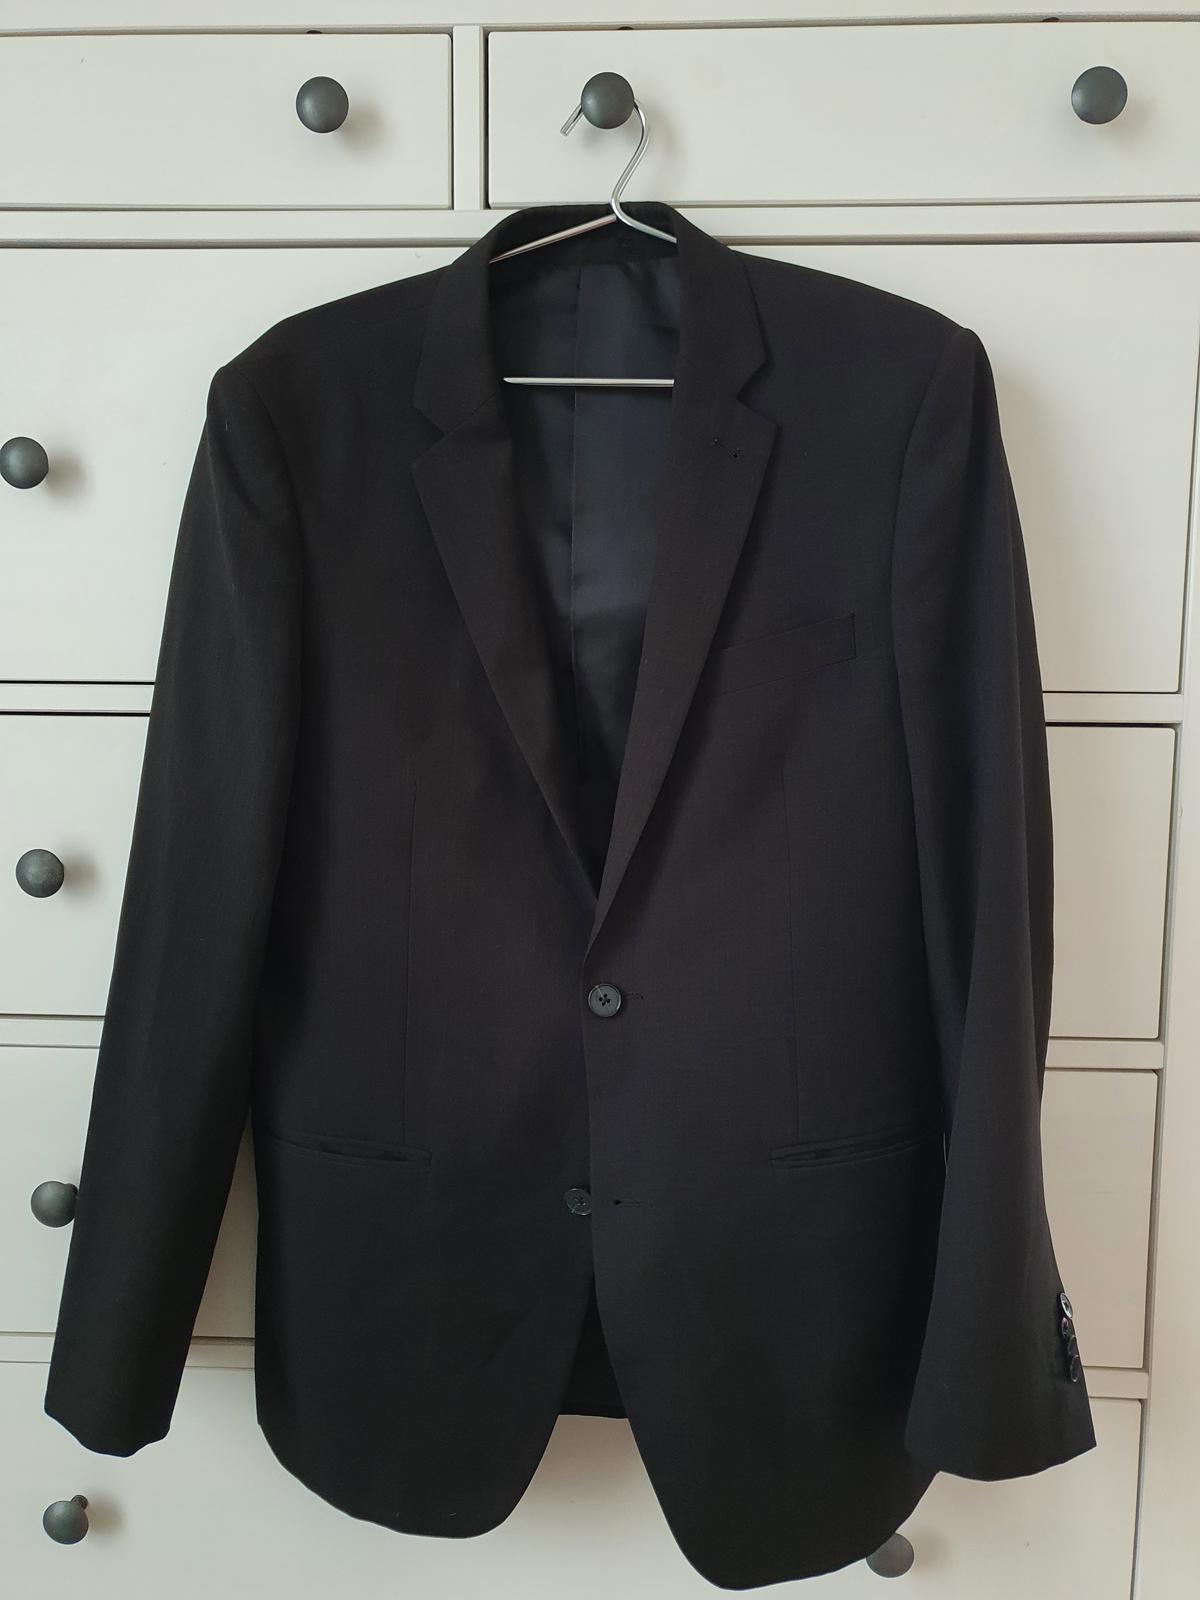 Černý pánský oblek - Obrázek č. 1